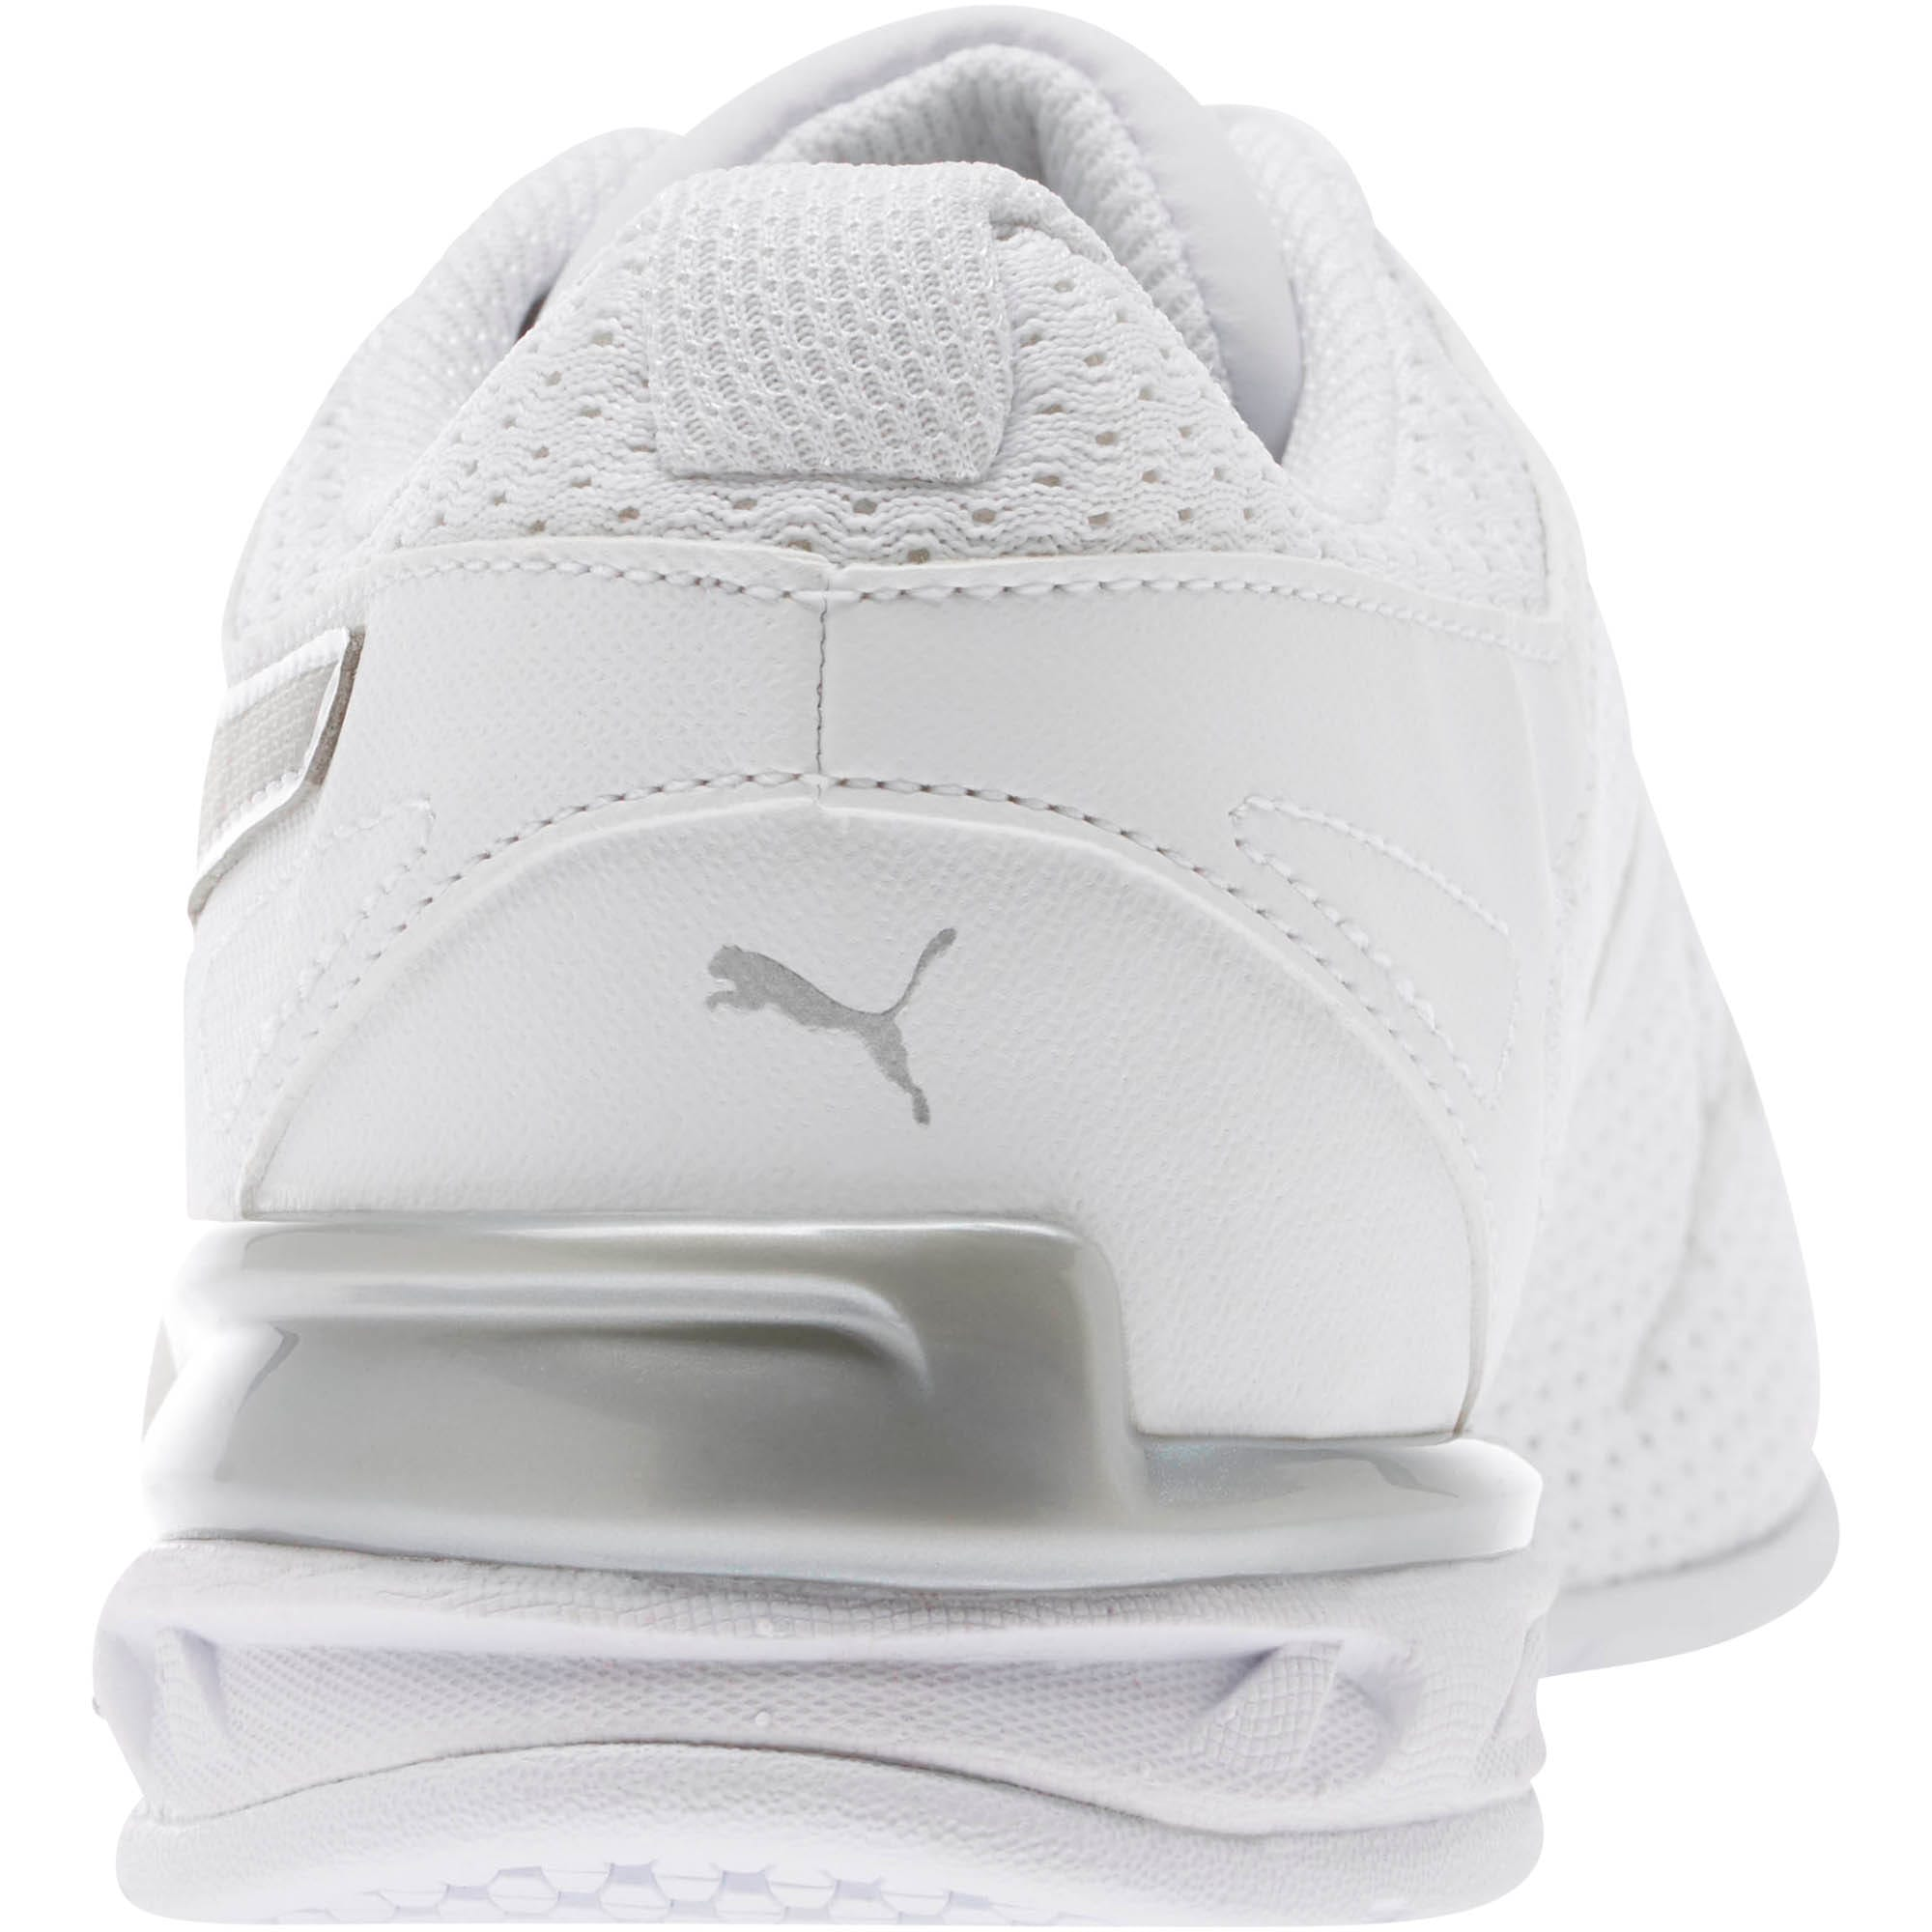 Thumbnail 4 of Tazon 6 Knit Women's Sneakers, Puma White-Puma Silver, medium